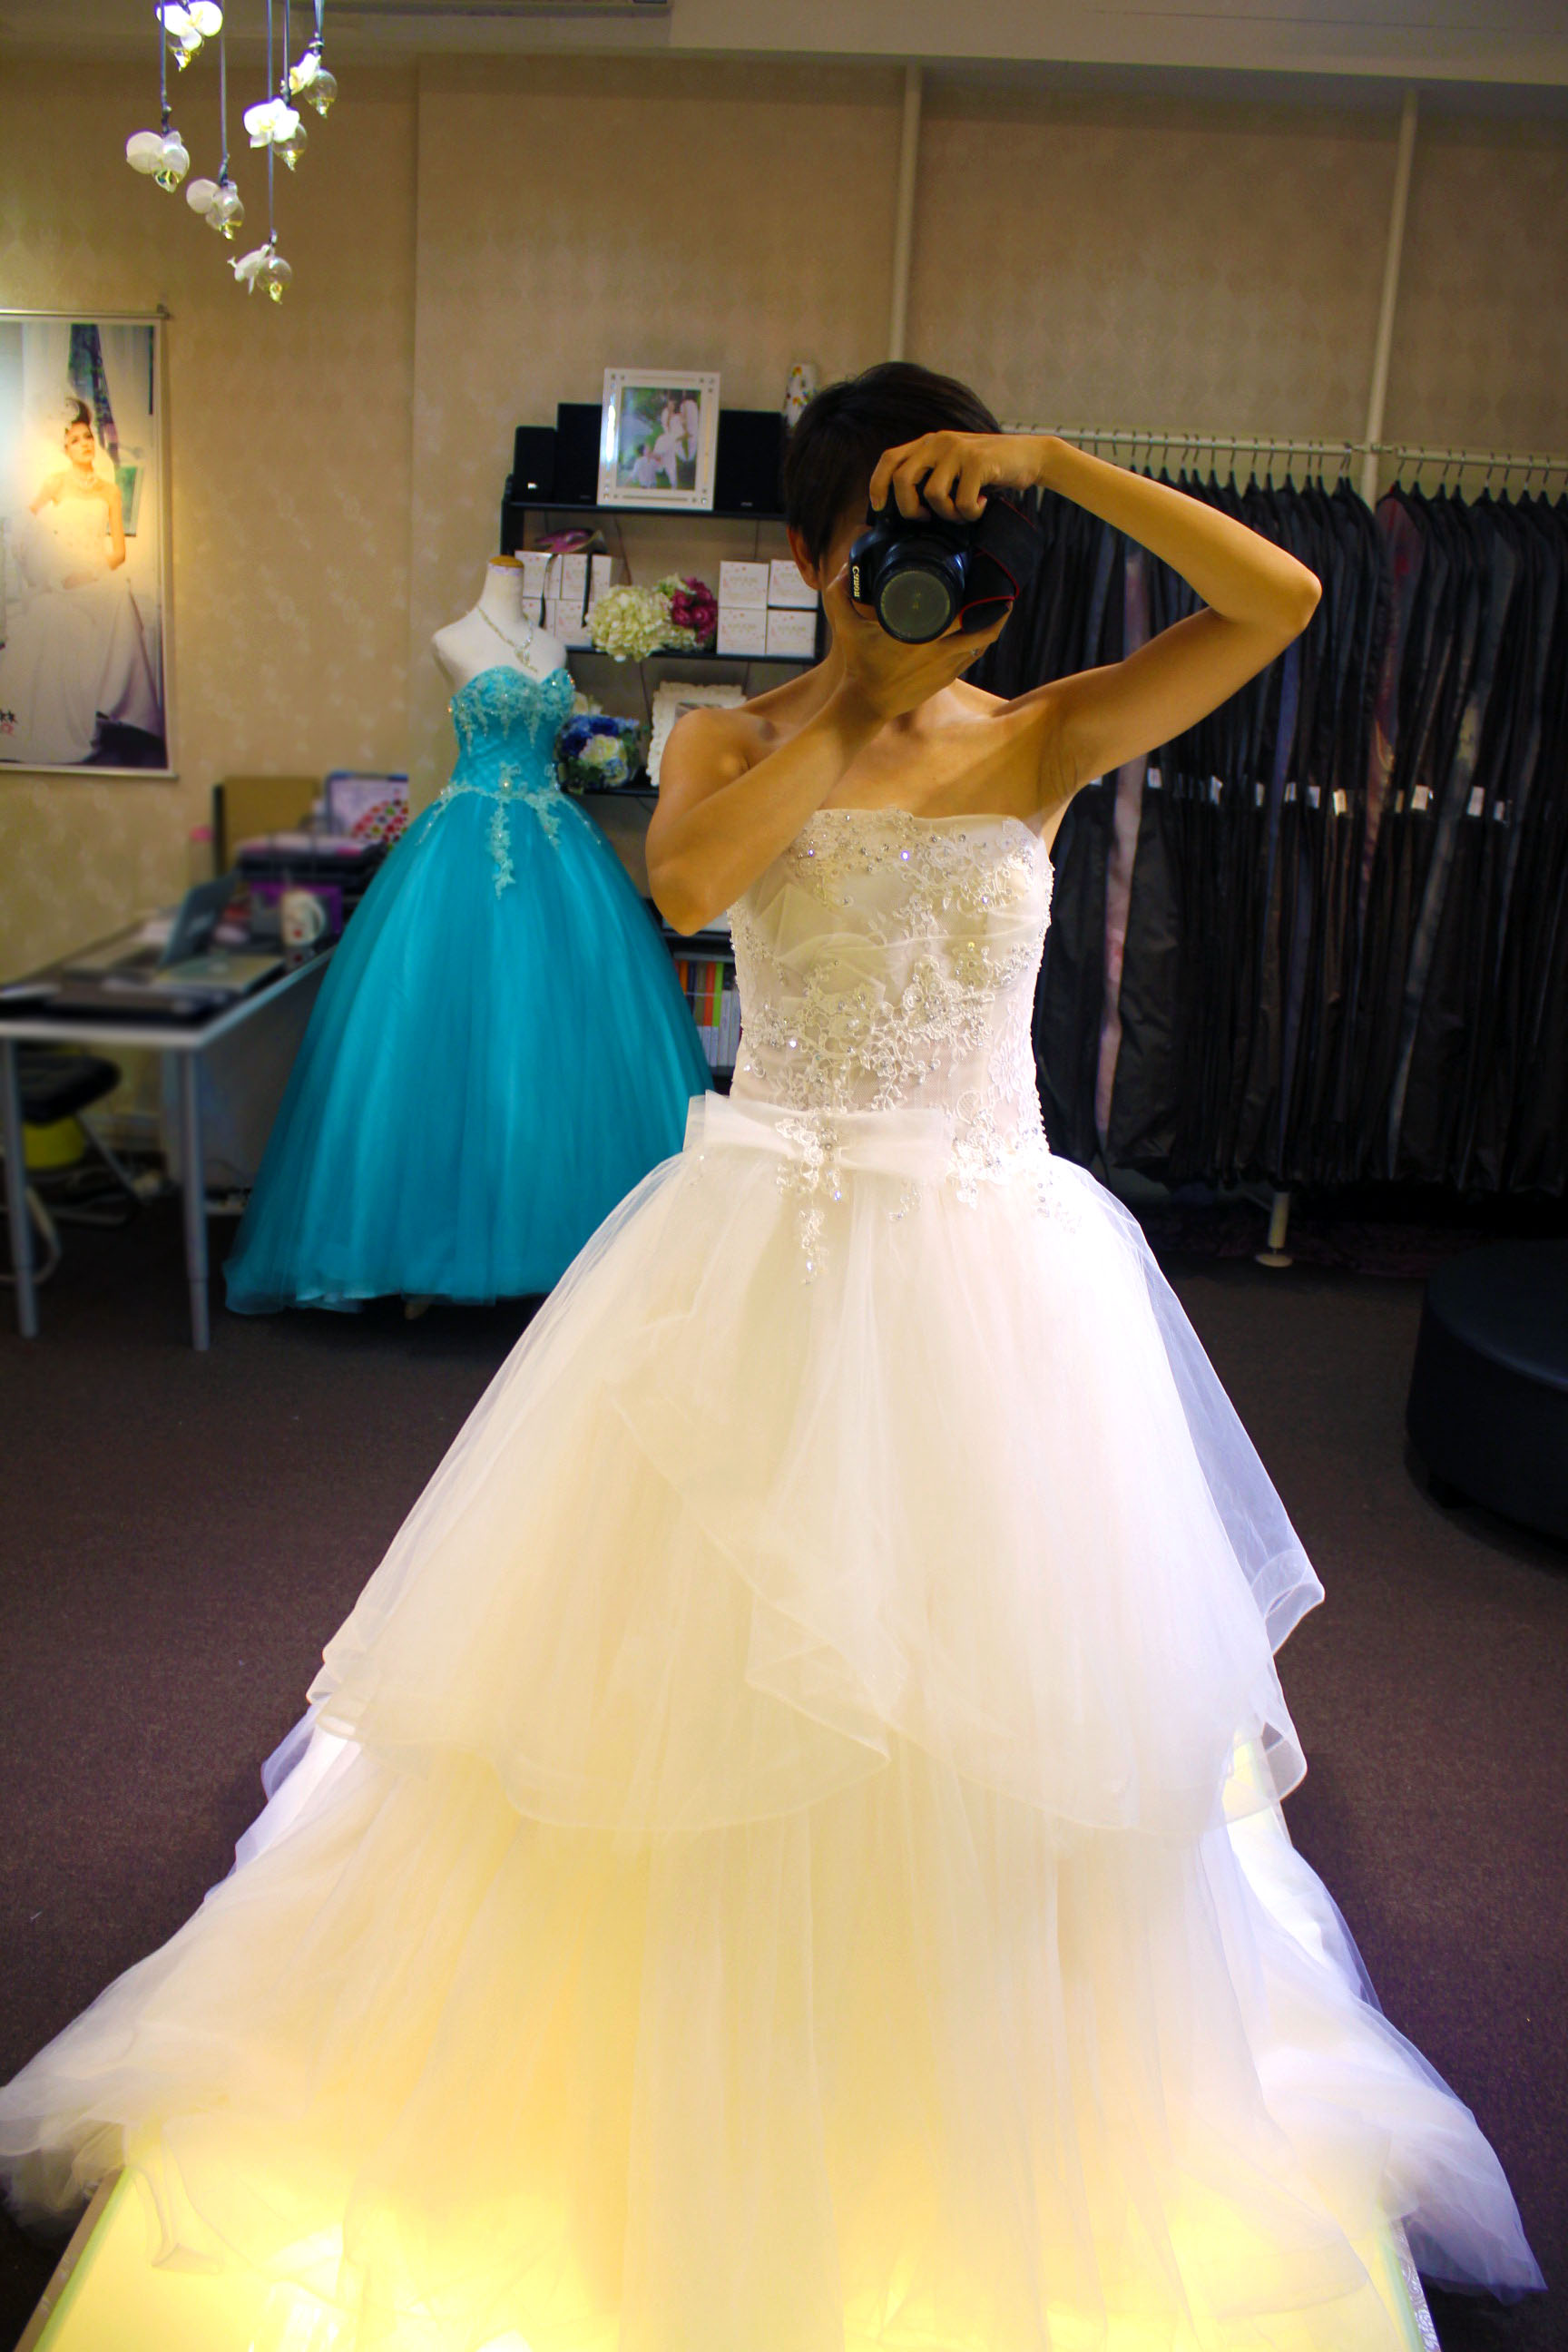 Indian Wedding Dress Rental Singapore - Junoir Bridesmaid Dresses